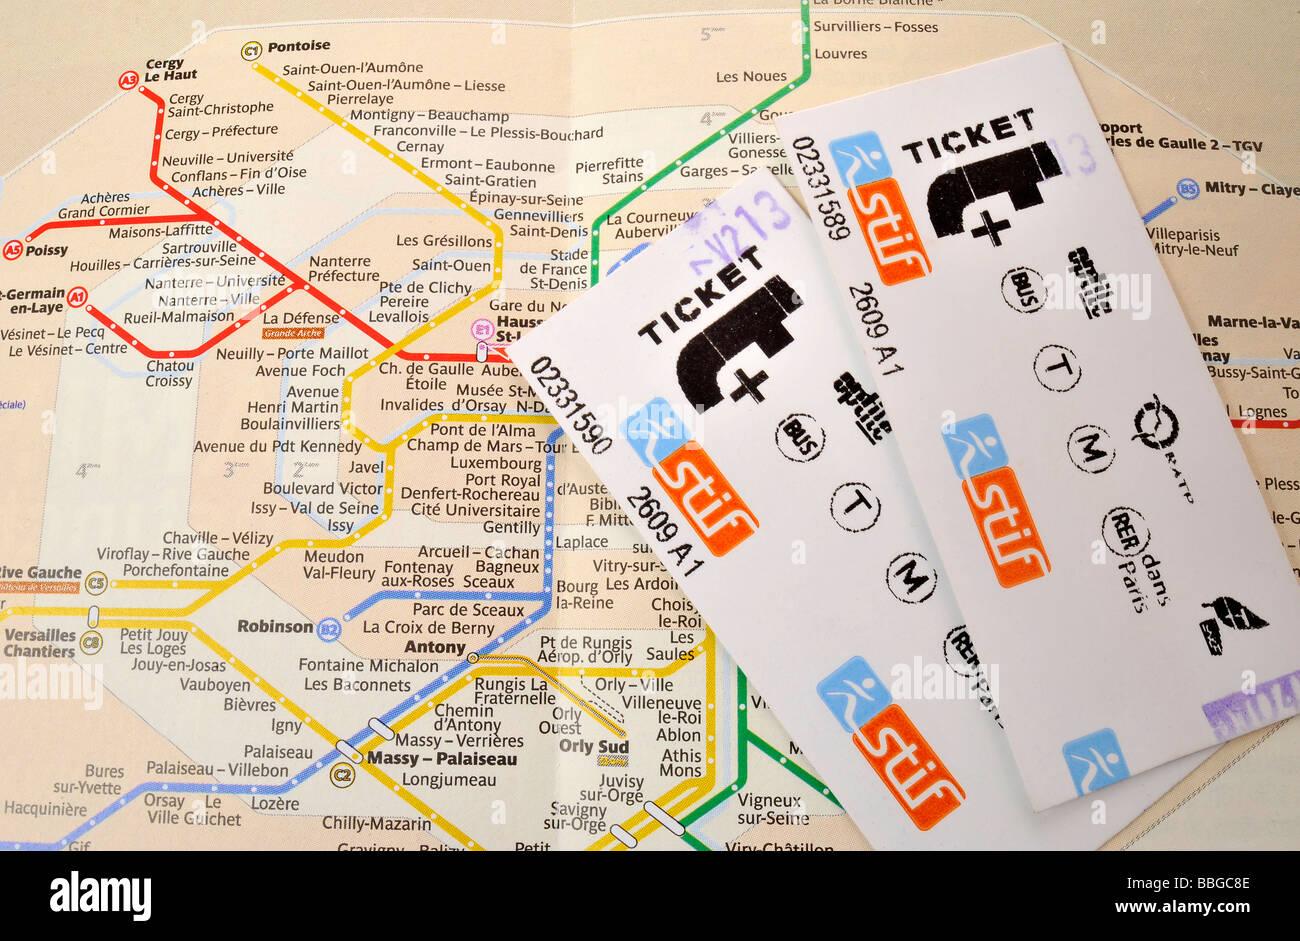 Single tickets on a plan of the Paris Metro, Paris, France, Europe - Stock Image